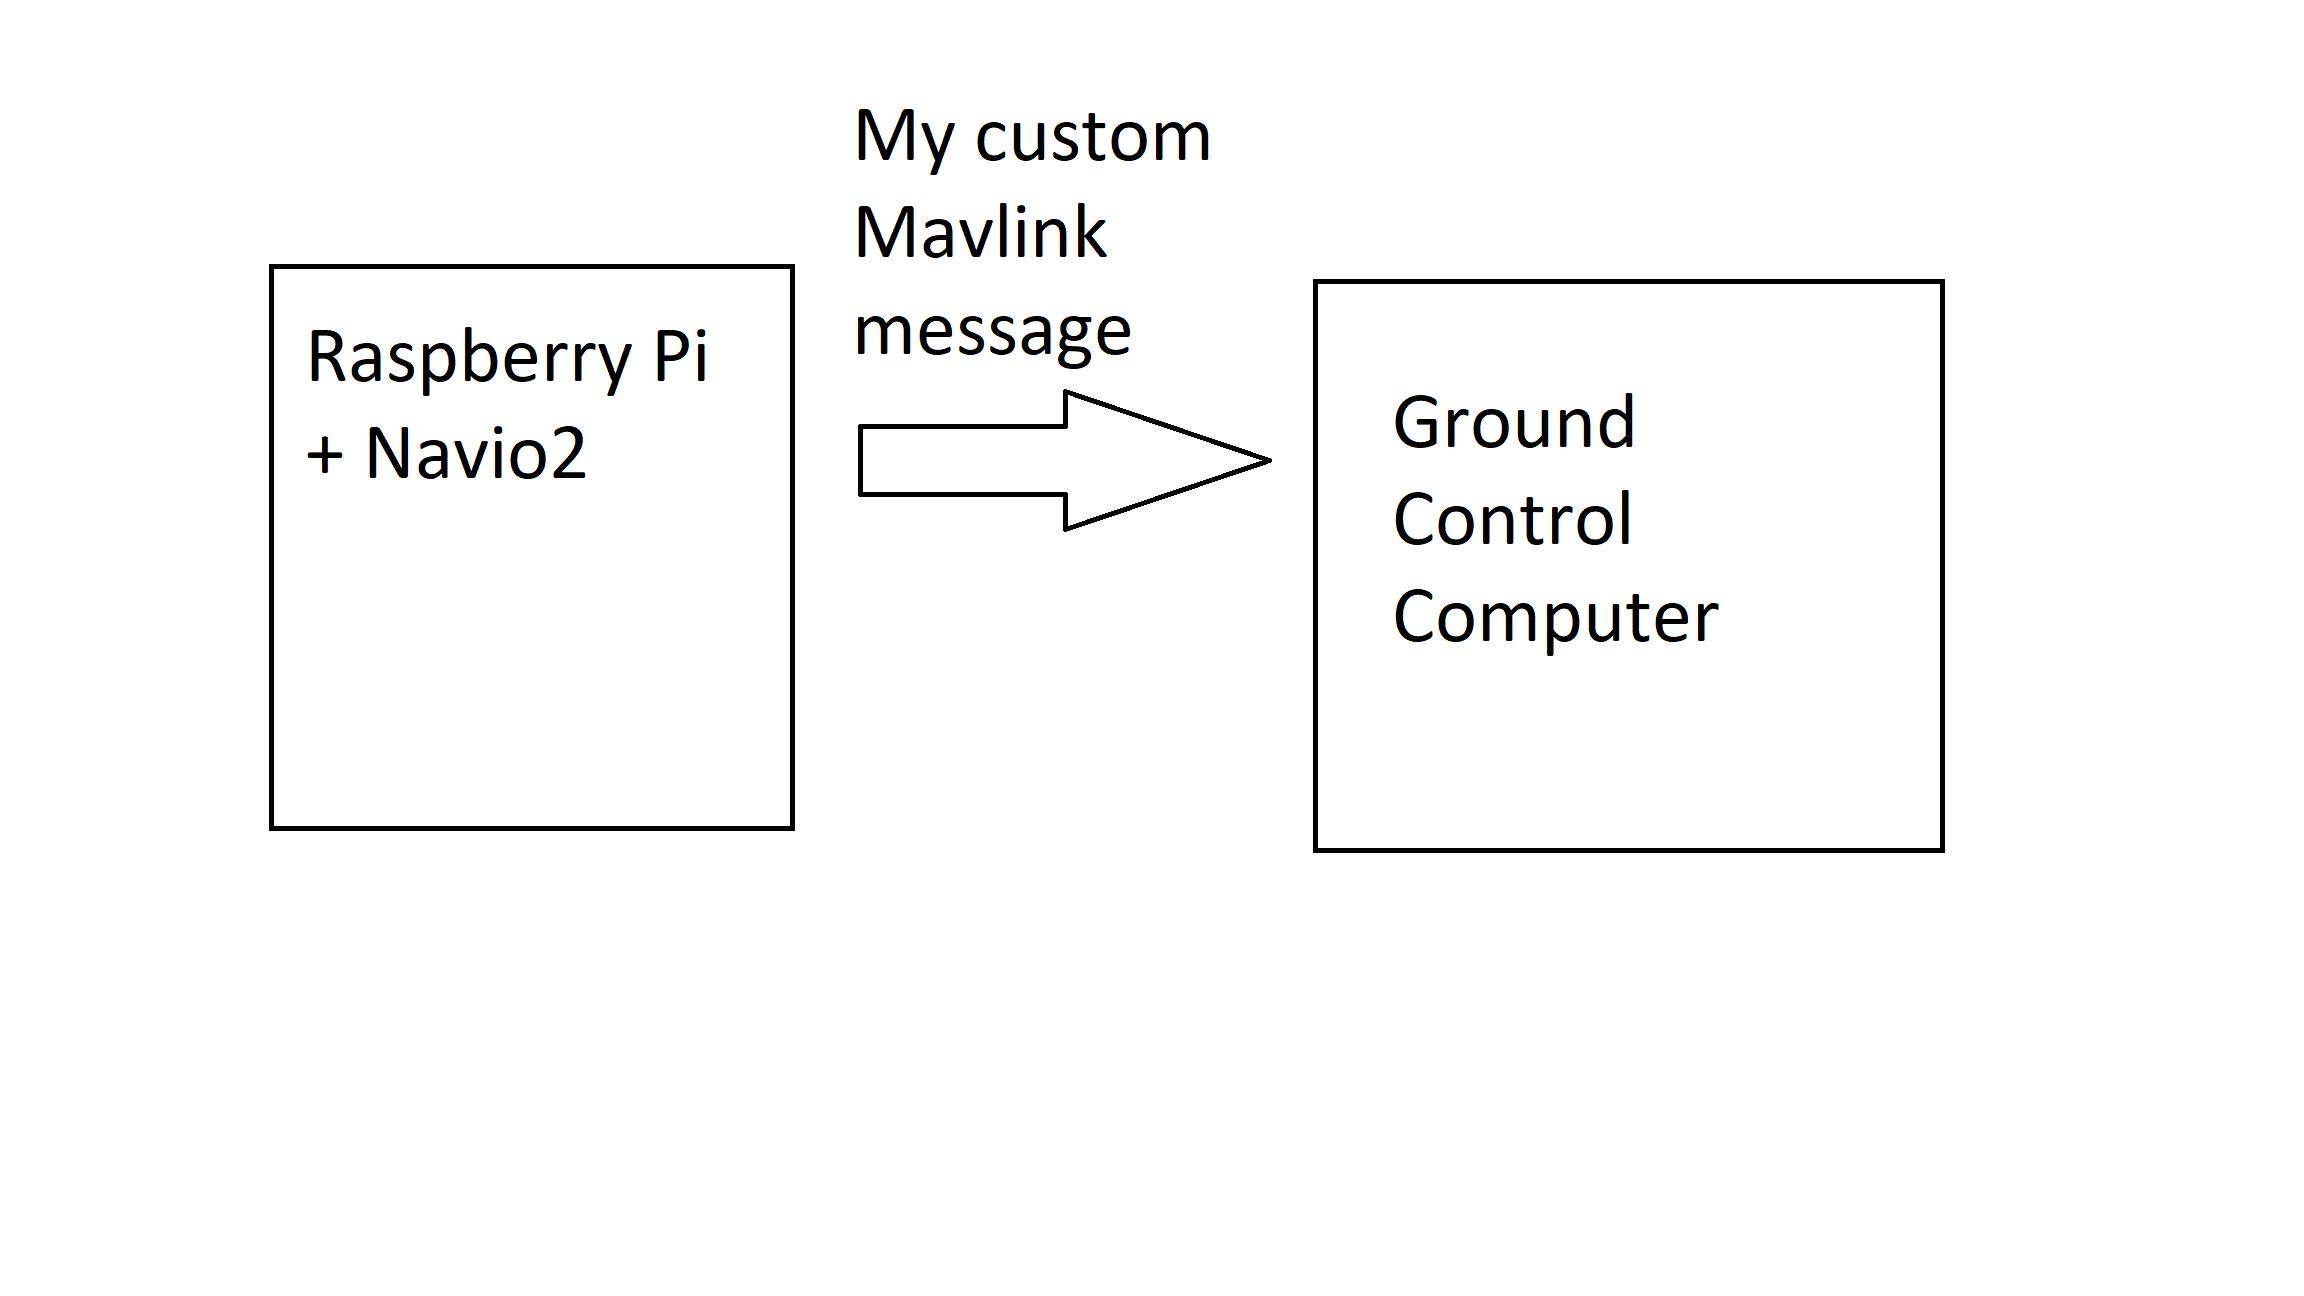 Sending a Custom Mavlink Message - Hardware - Community Forum